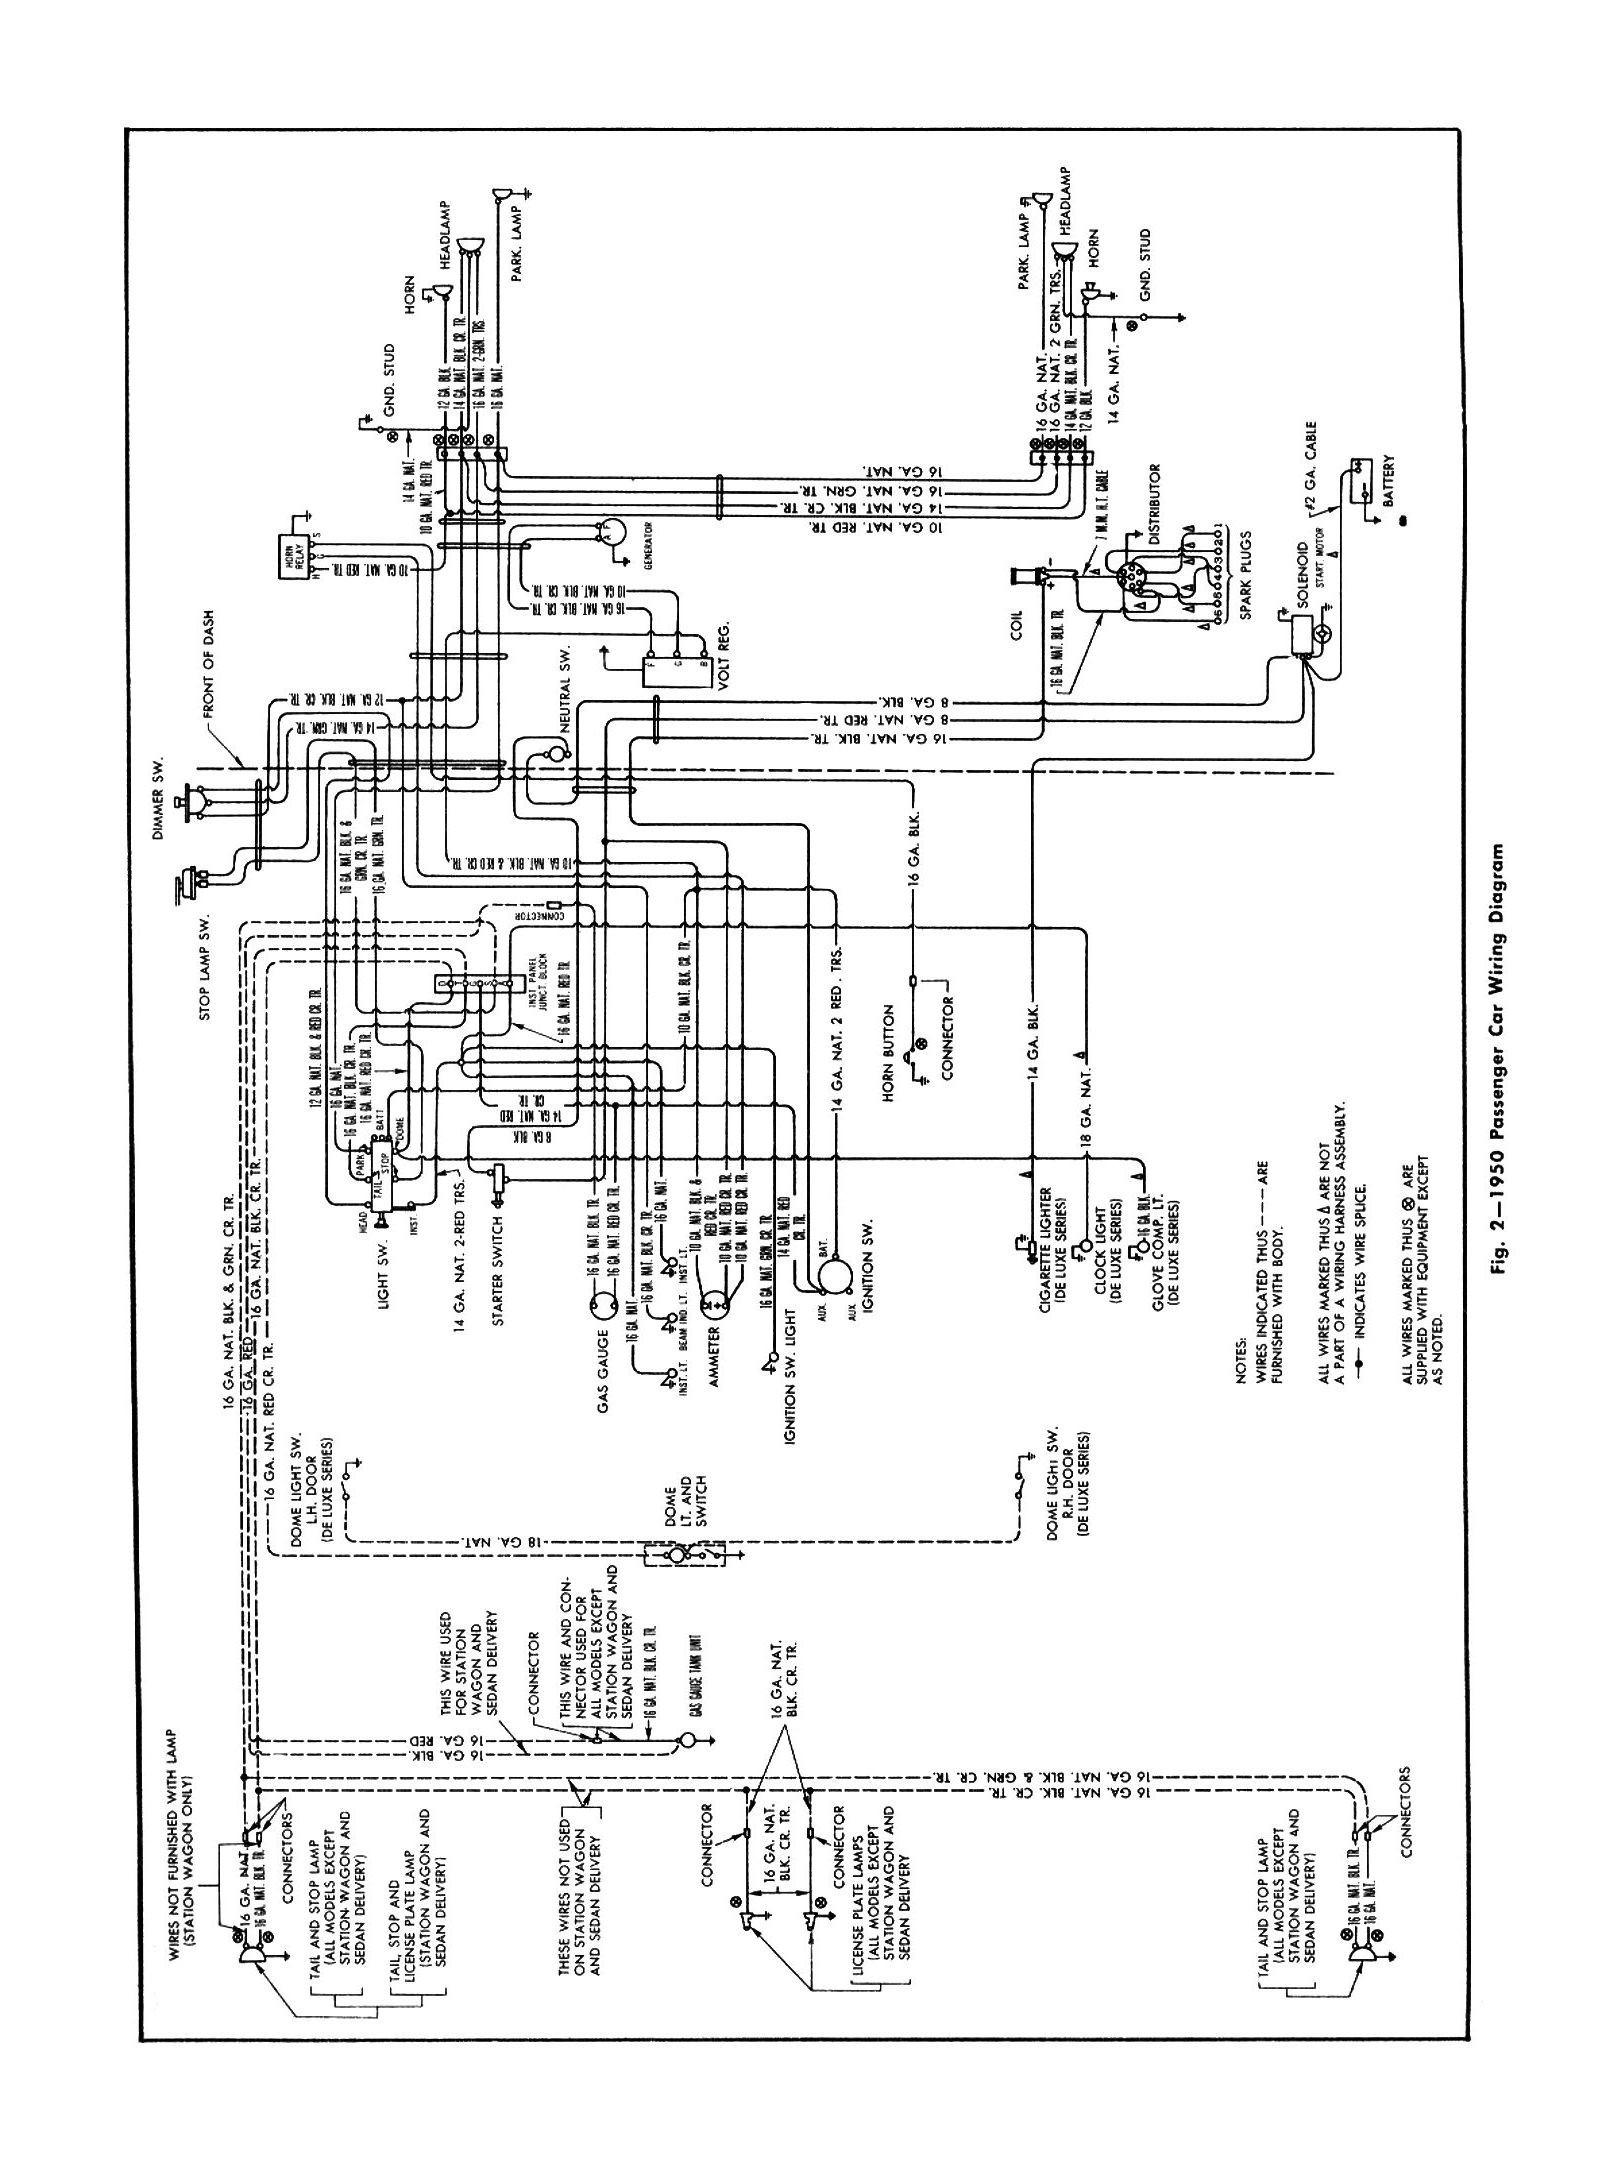 1950 Car General Wiring